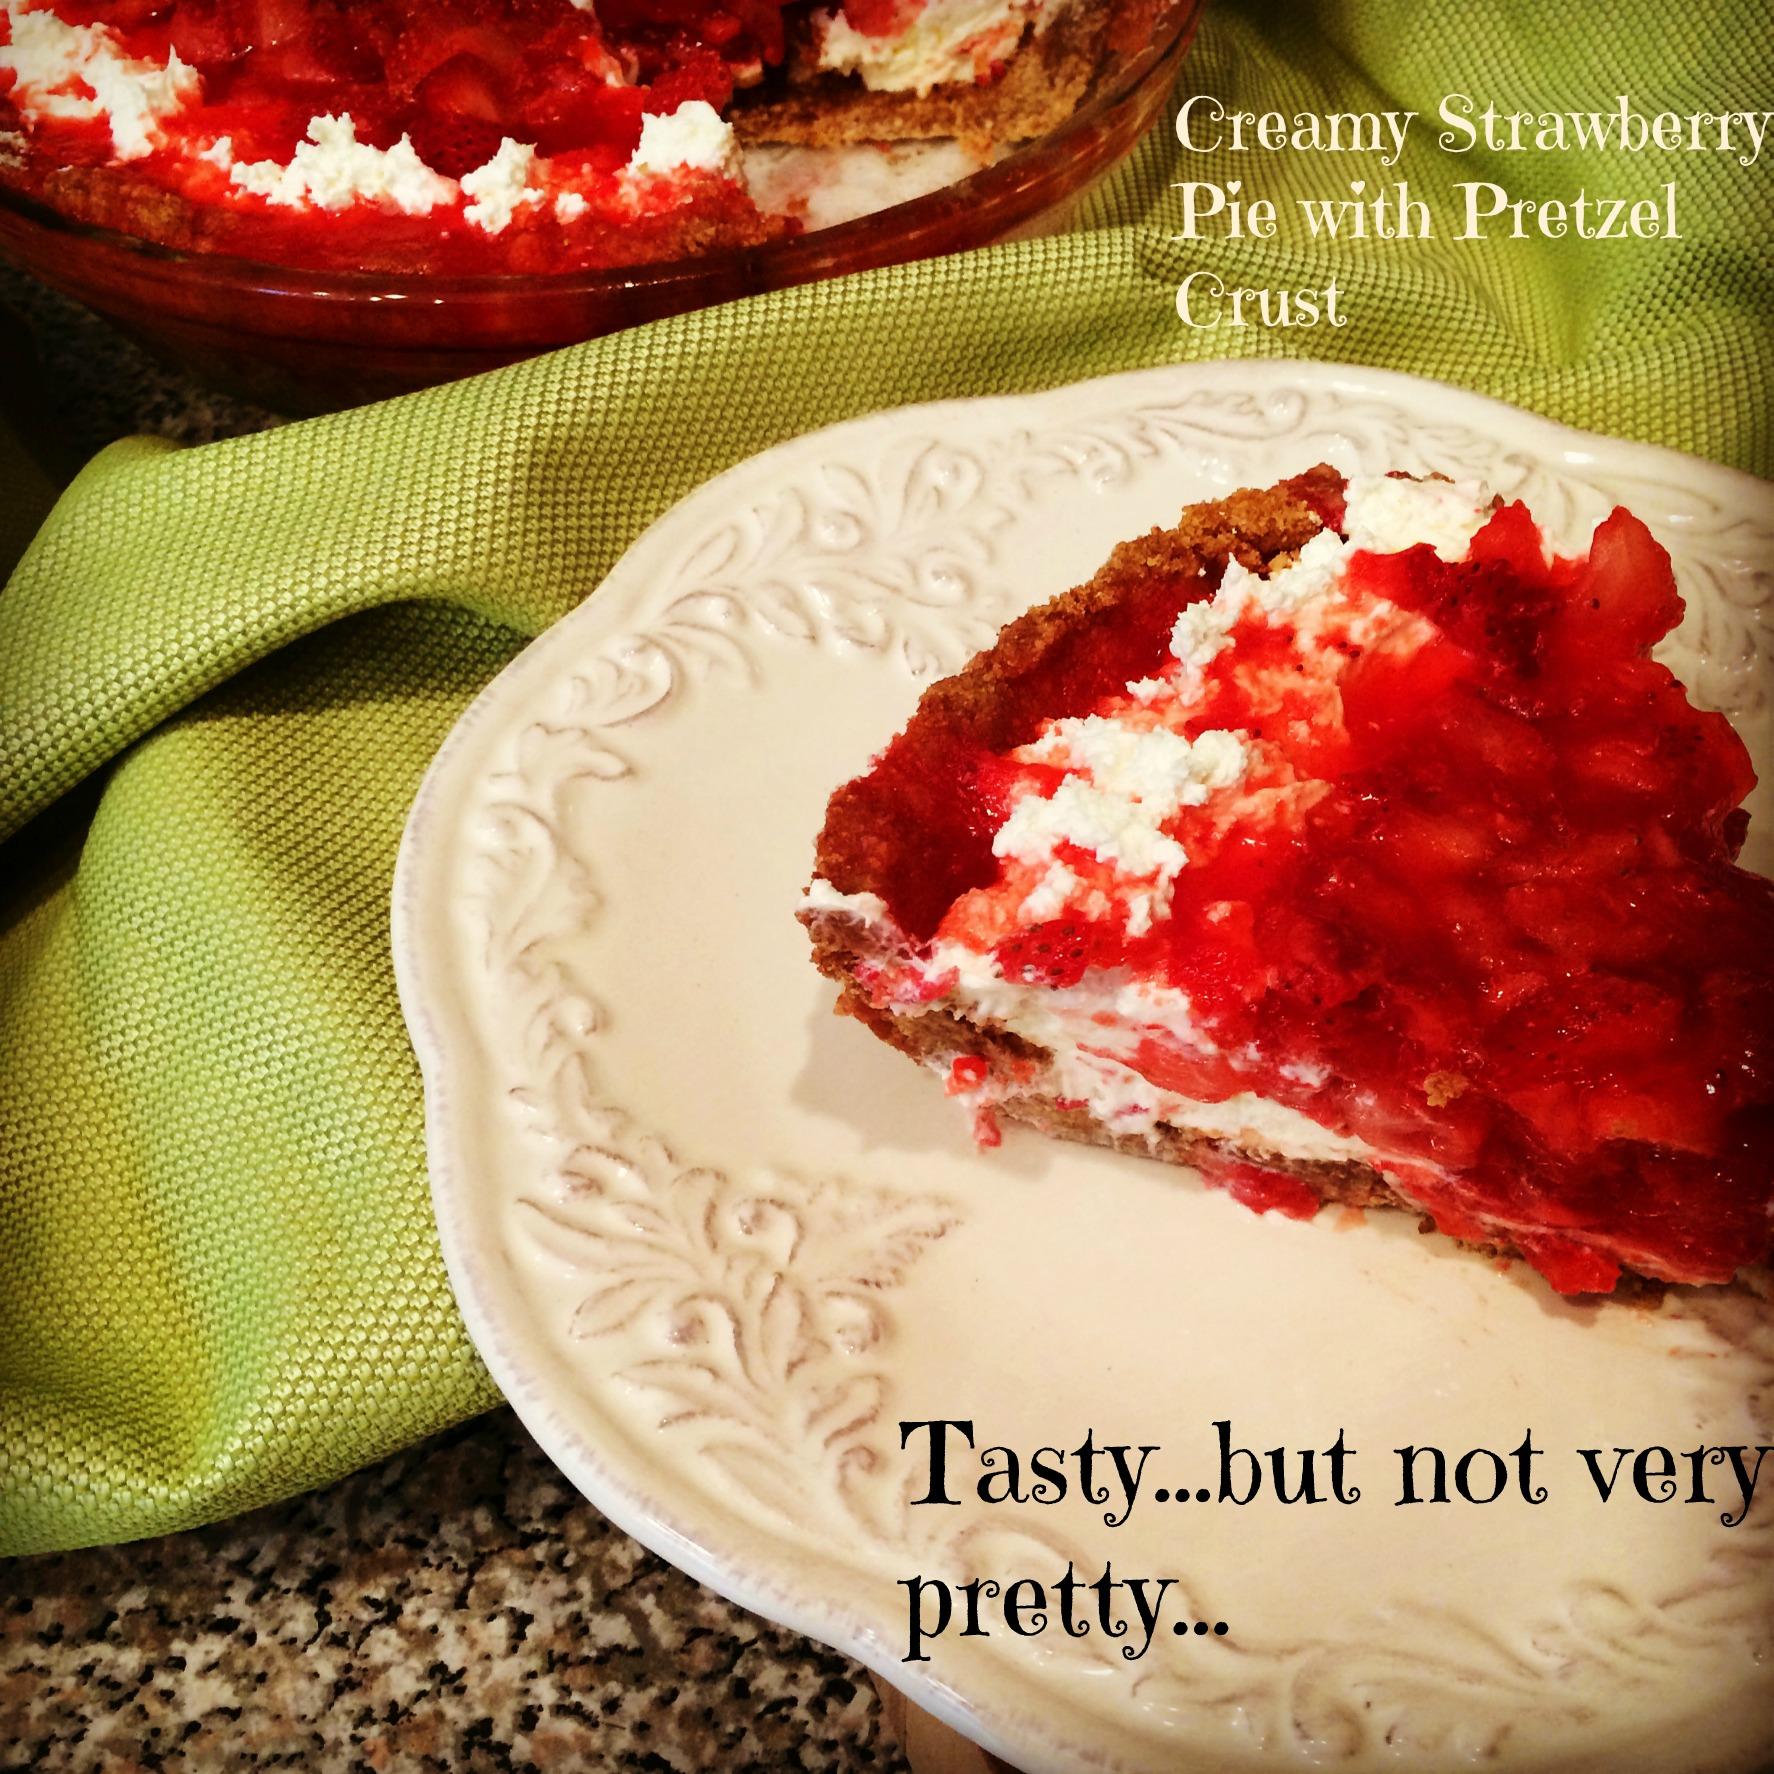 Accidental Cream Pie Best indiana's famous hoosier sugar cream pie recipe